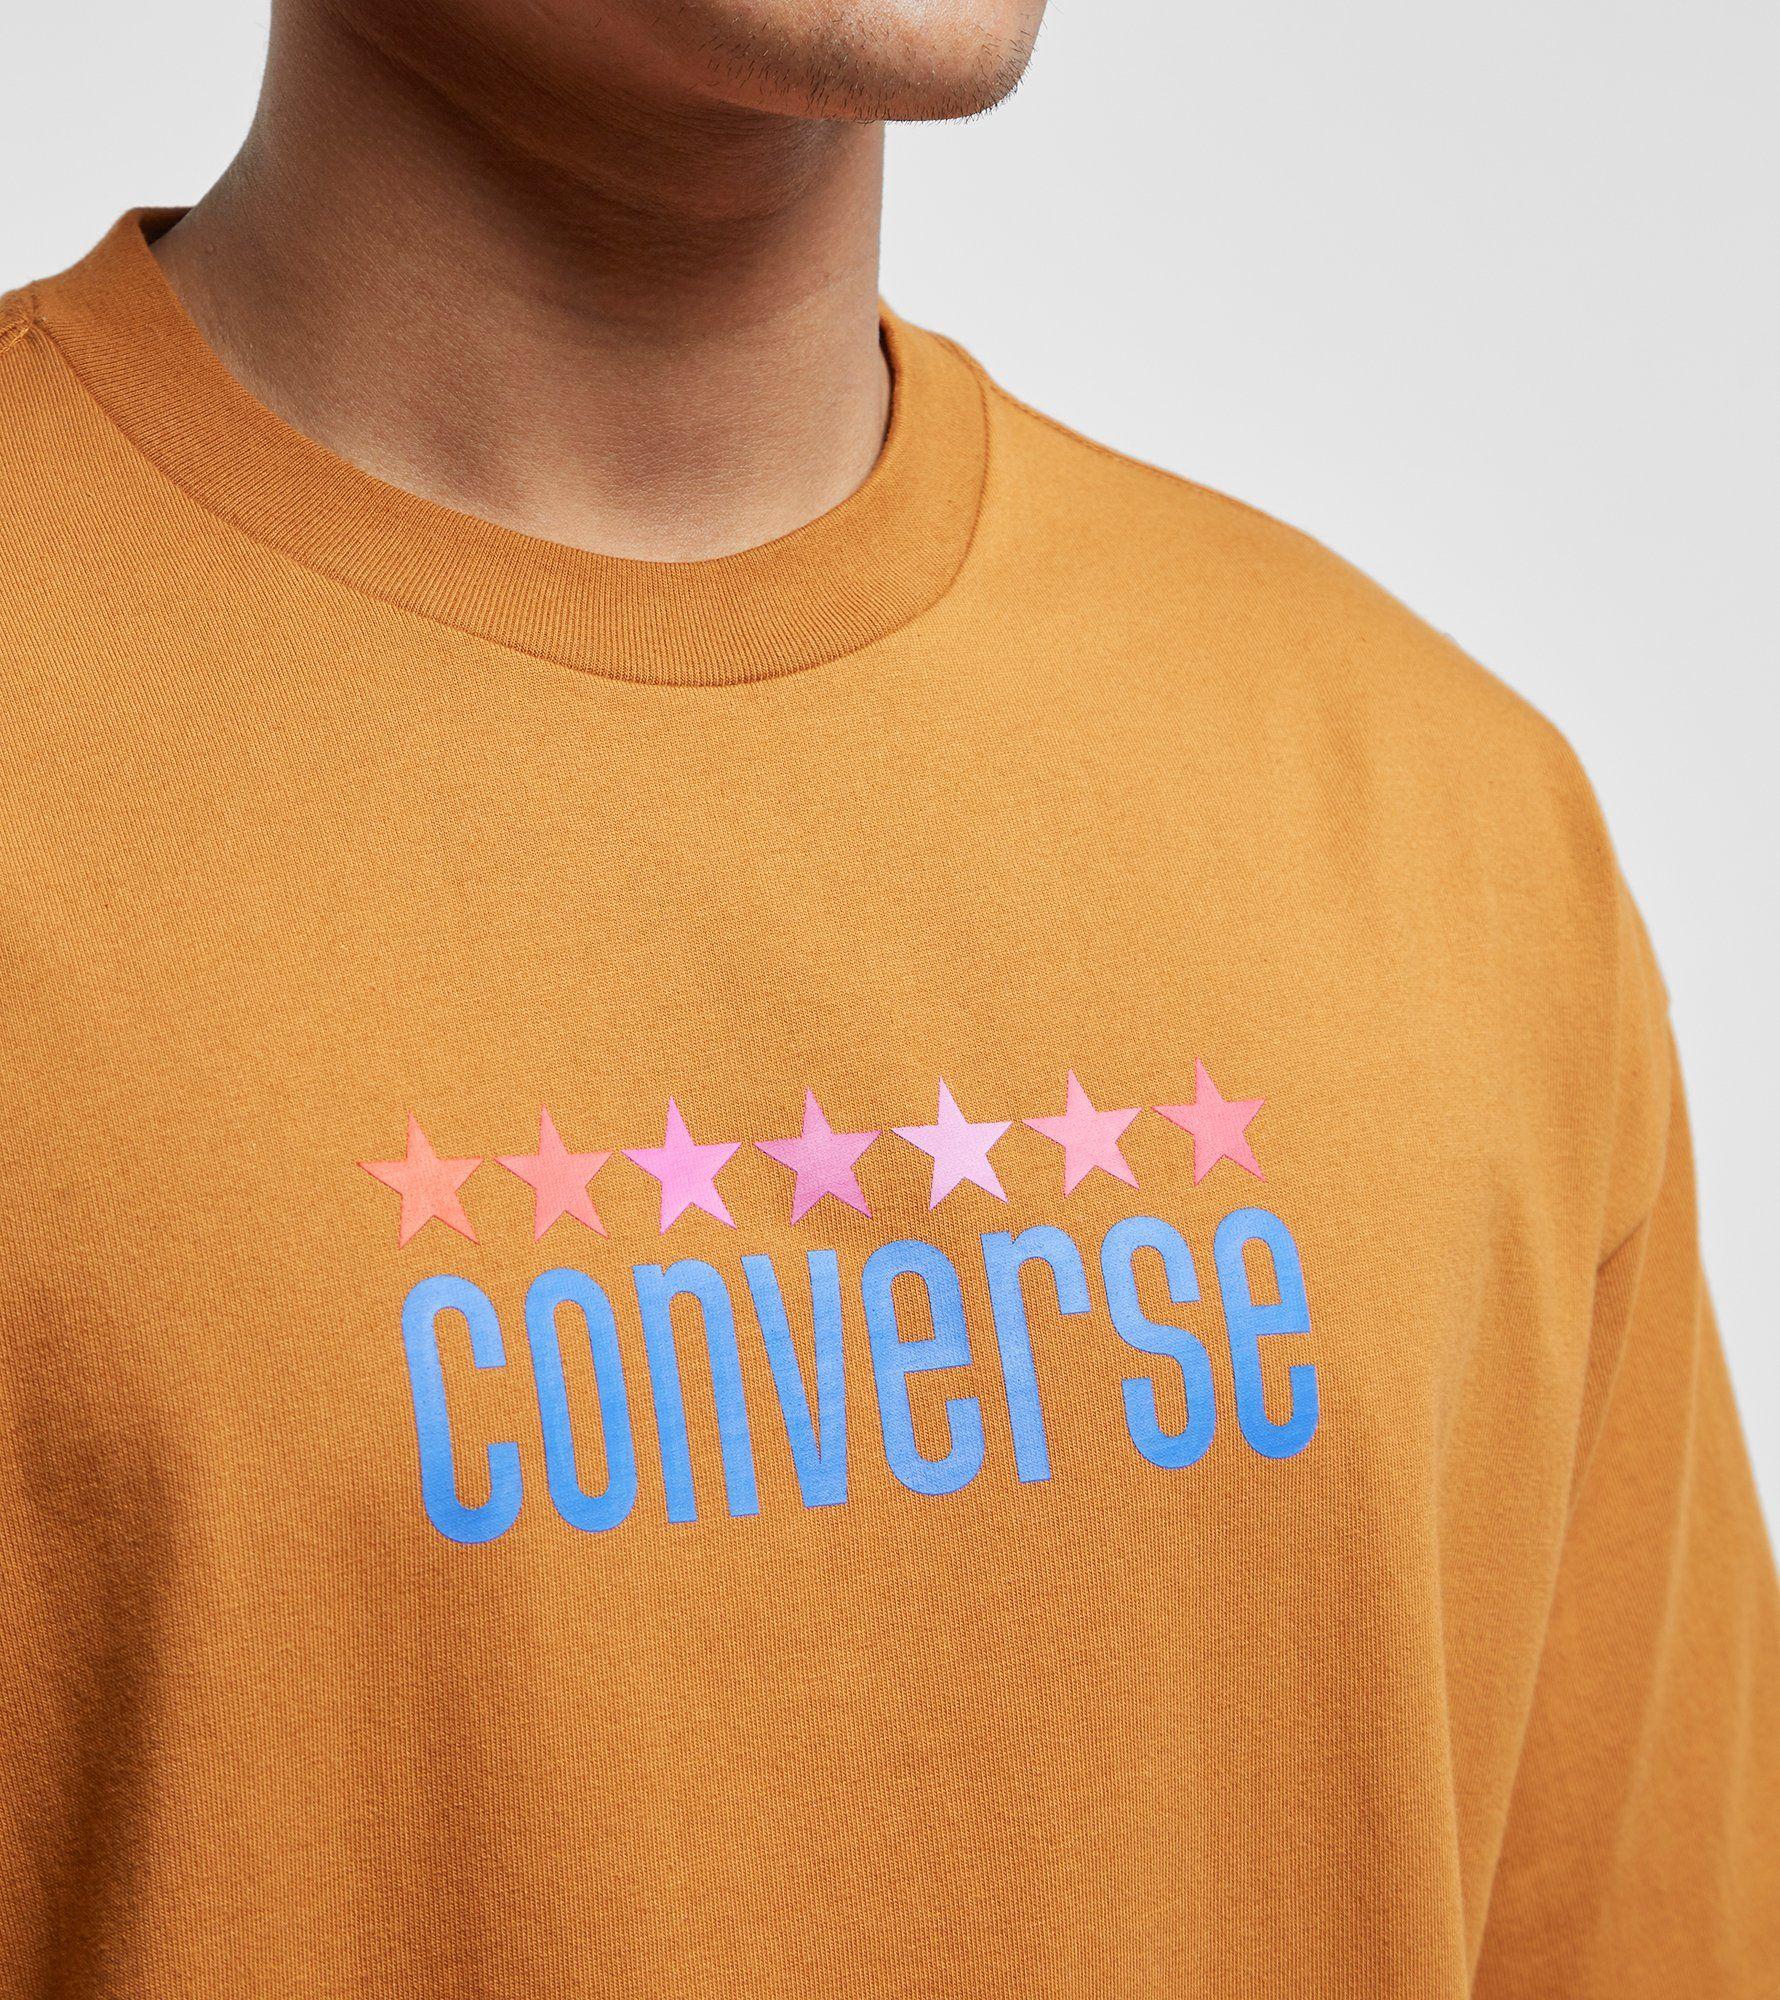 Converse x A$AP Nast Woodmark T-Shirt